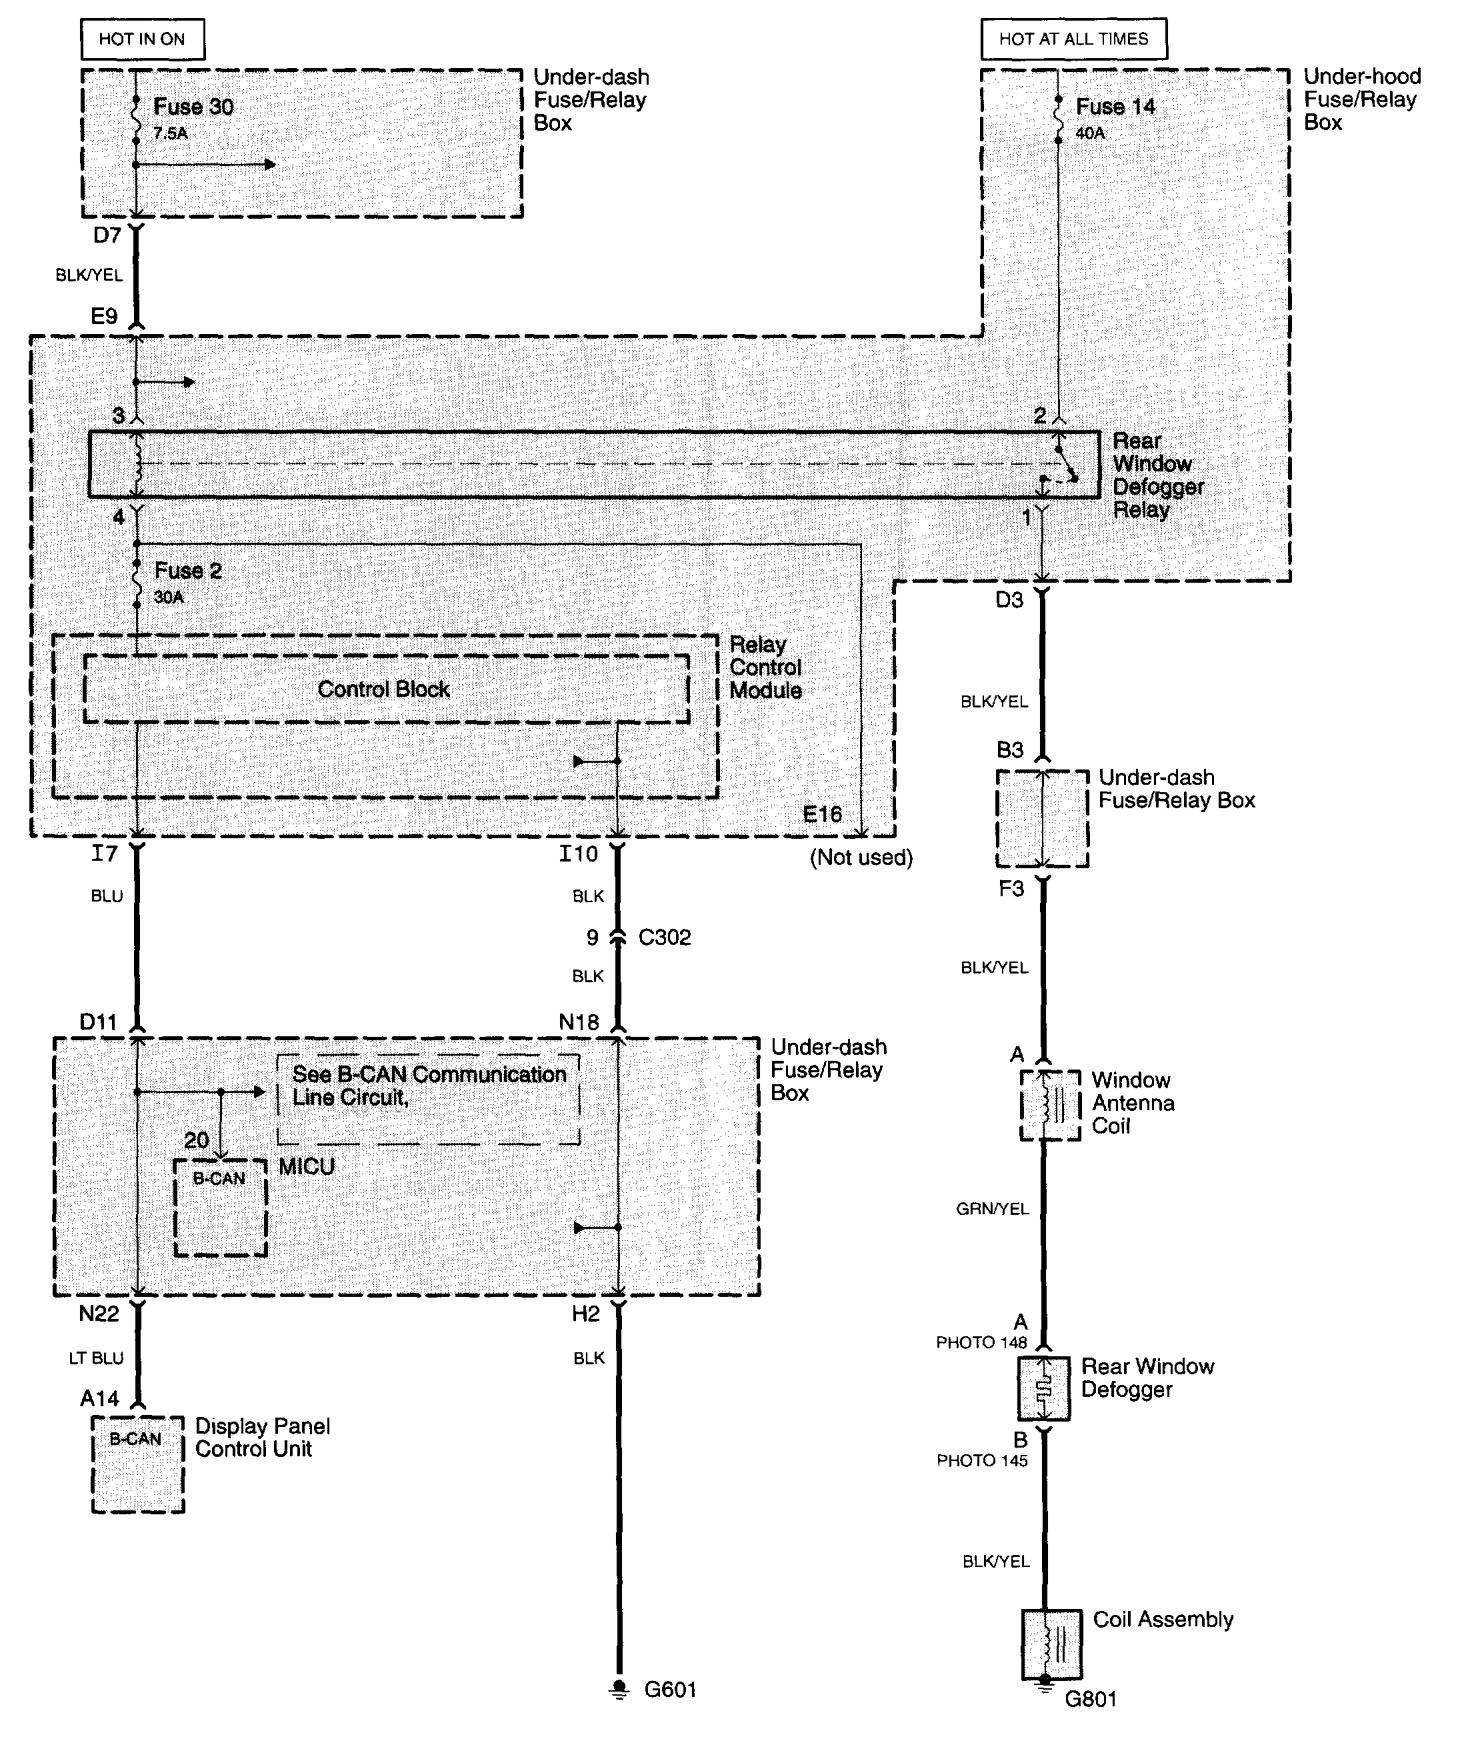 hight resolution of 2002 acura rsx window wiring diagram imageresizertool com acura rsx bose amplifier wiring diagram acura rsx